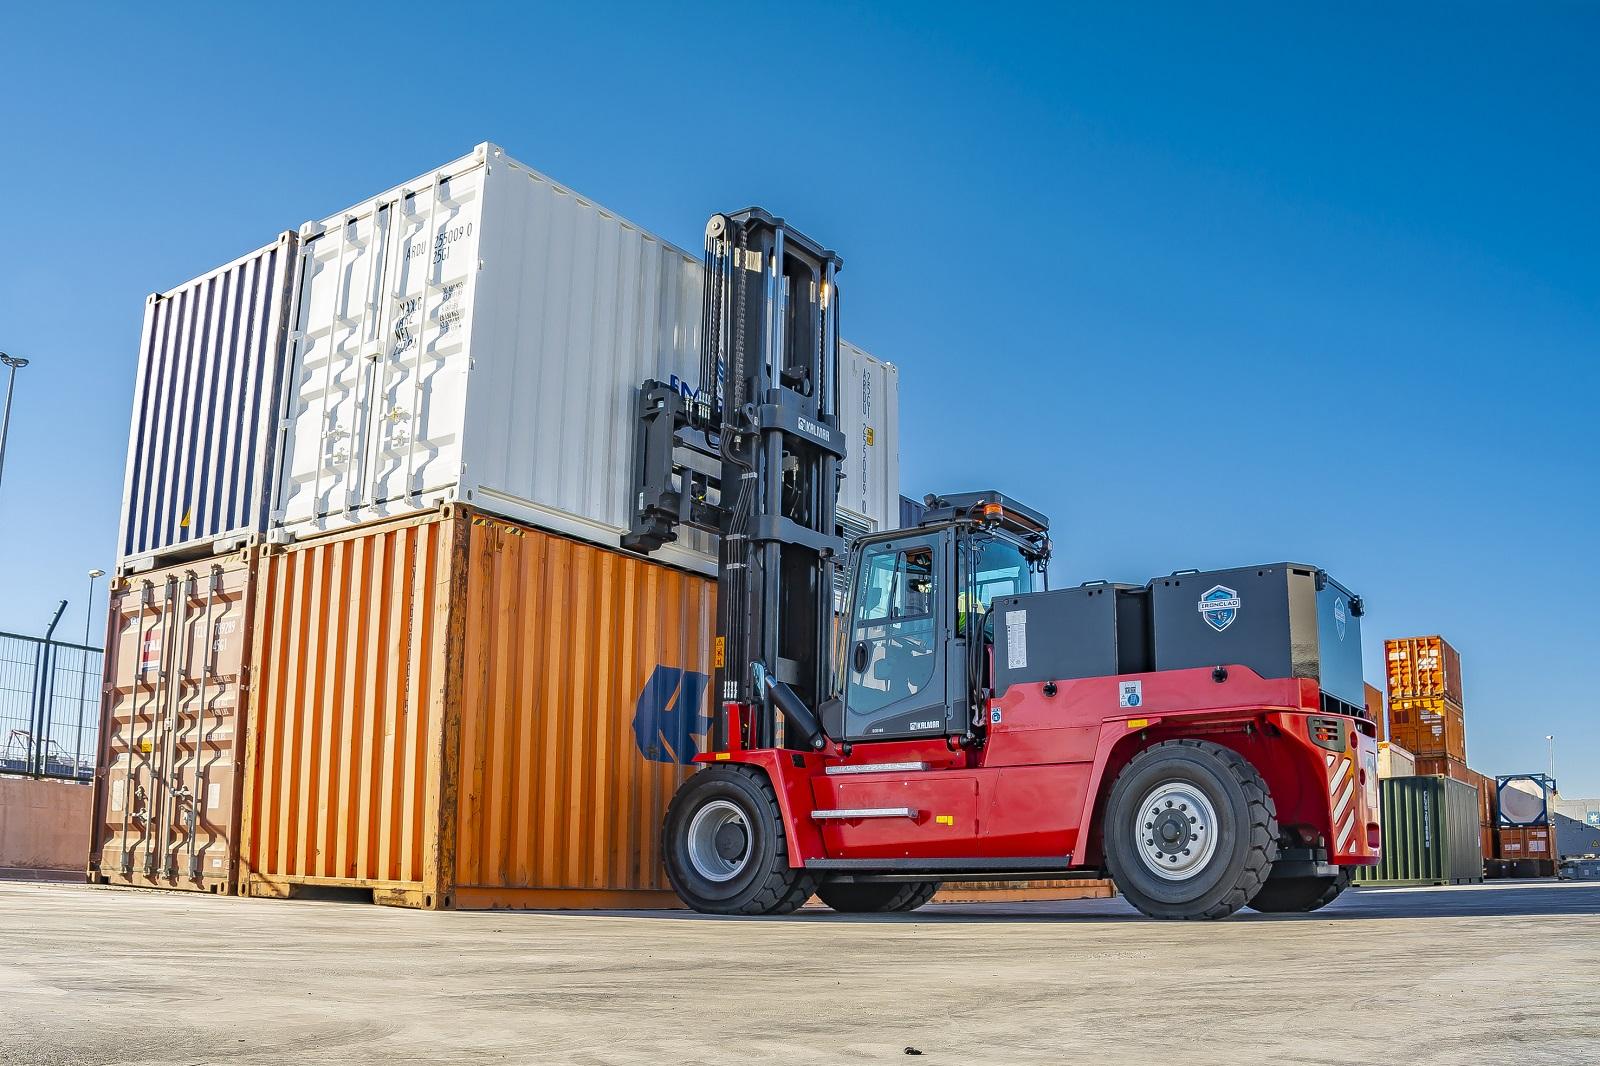 Kalmar to Supply 6 Electric Forklift Trucks to Brazilian logistics operator  Sagres - Logistics Manager